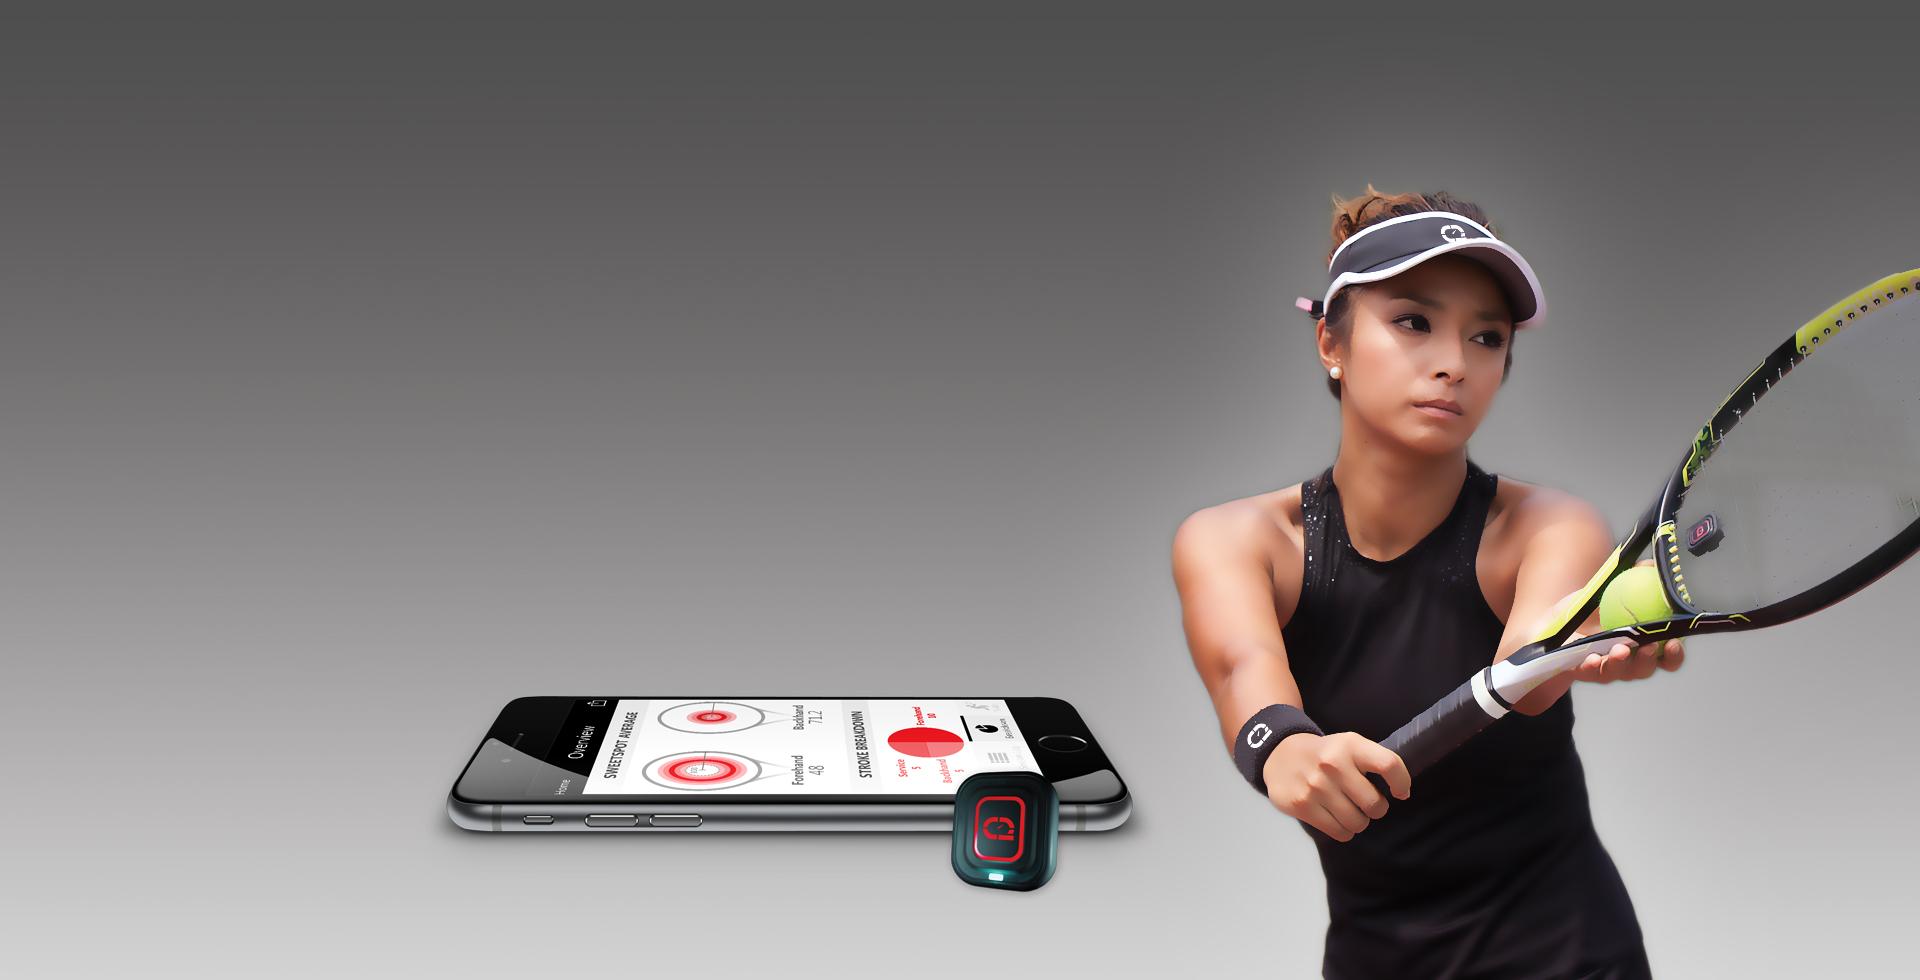 Qlipp Tennis Sensor Analyzes Strokes Of The Tennis Players